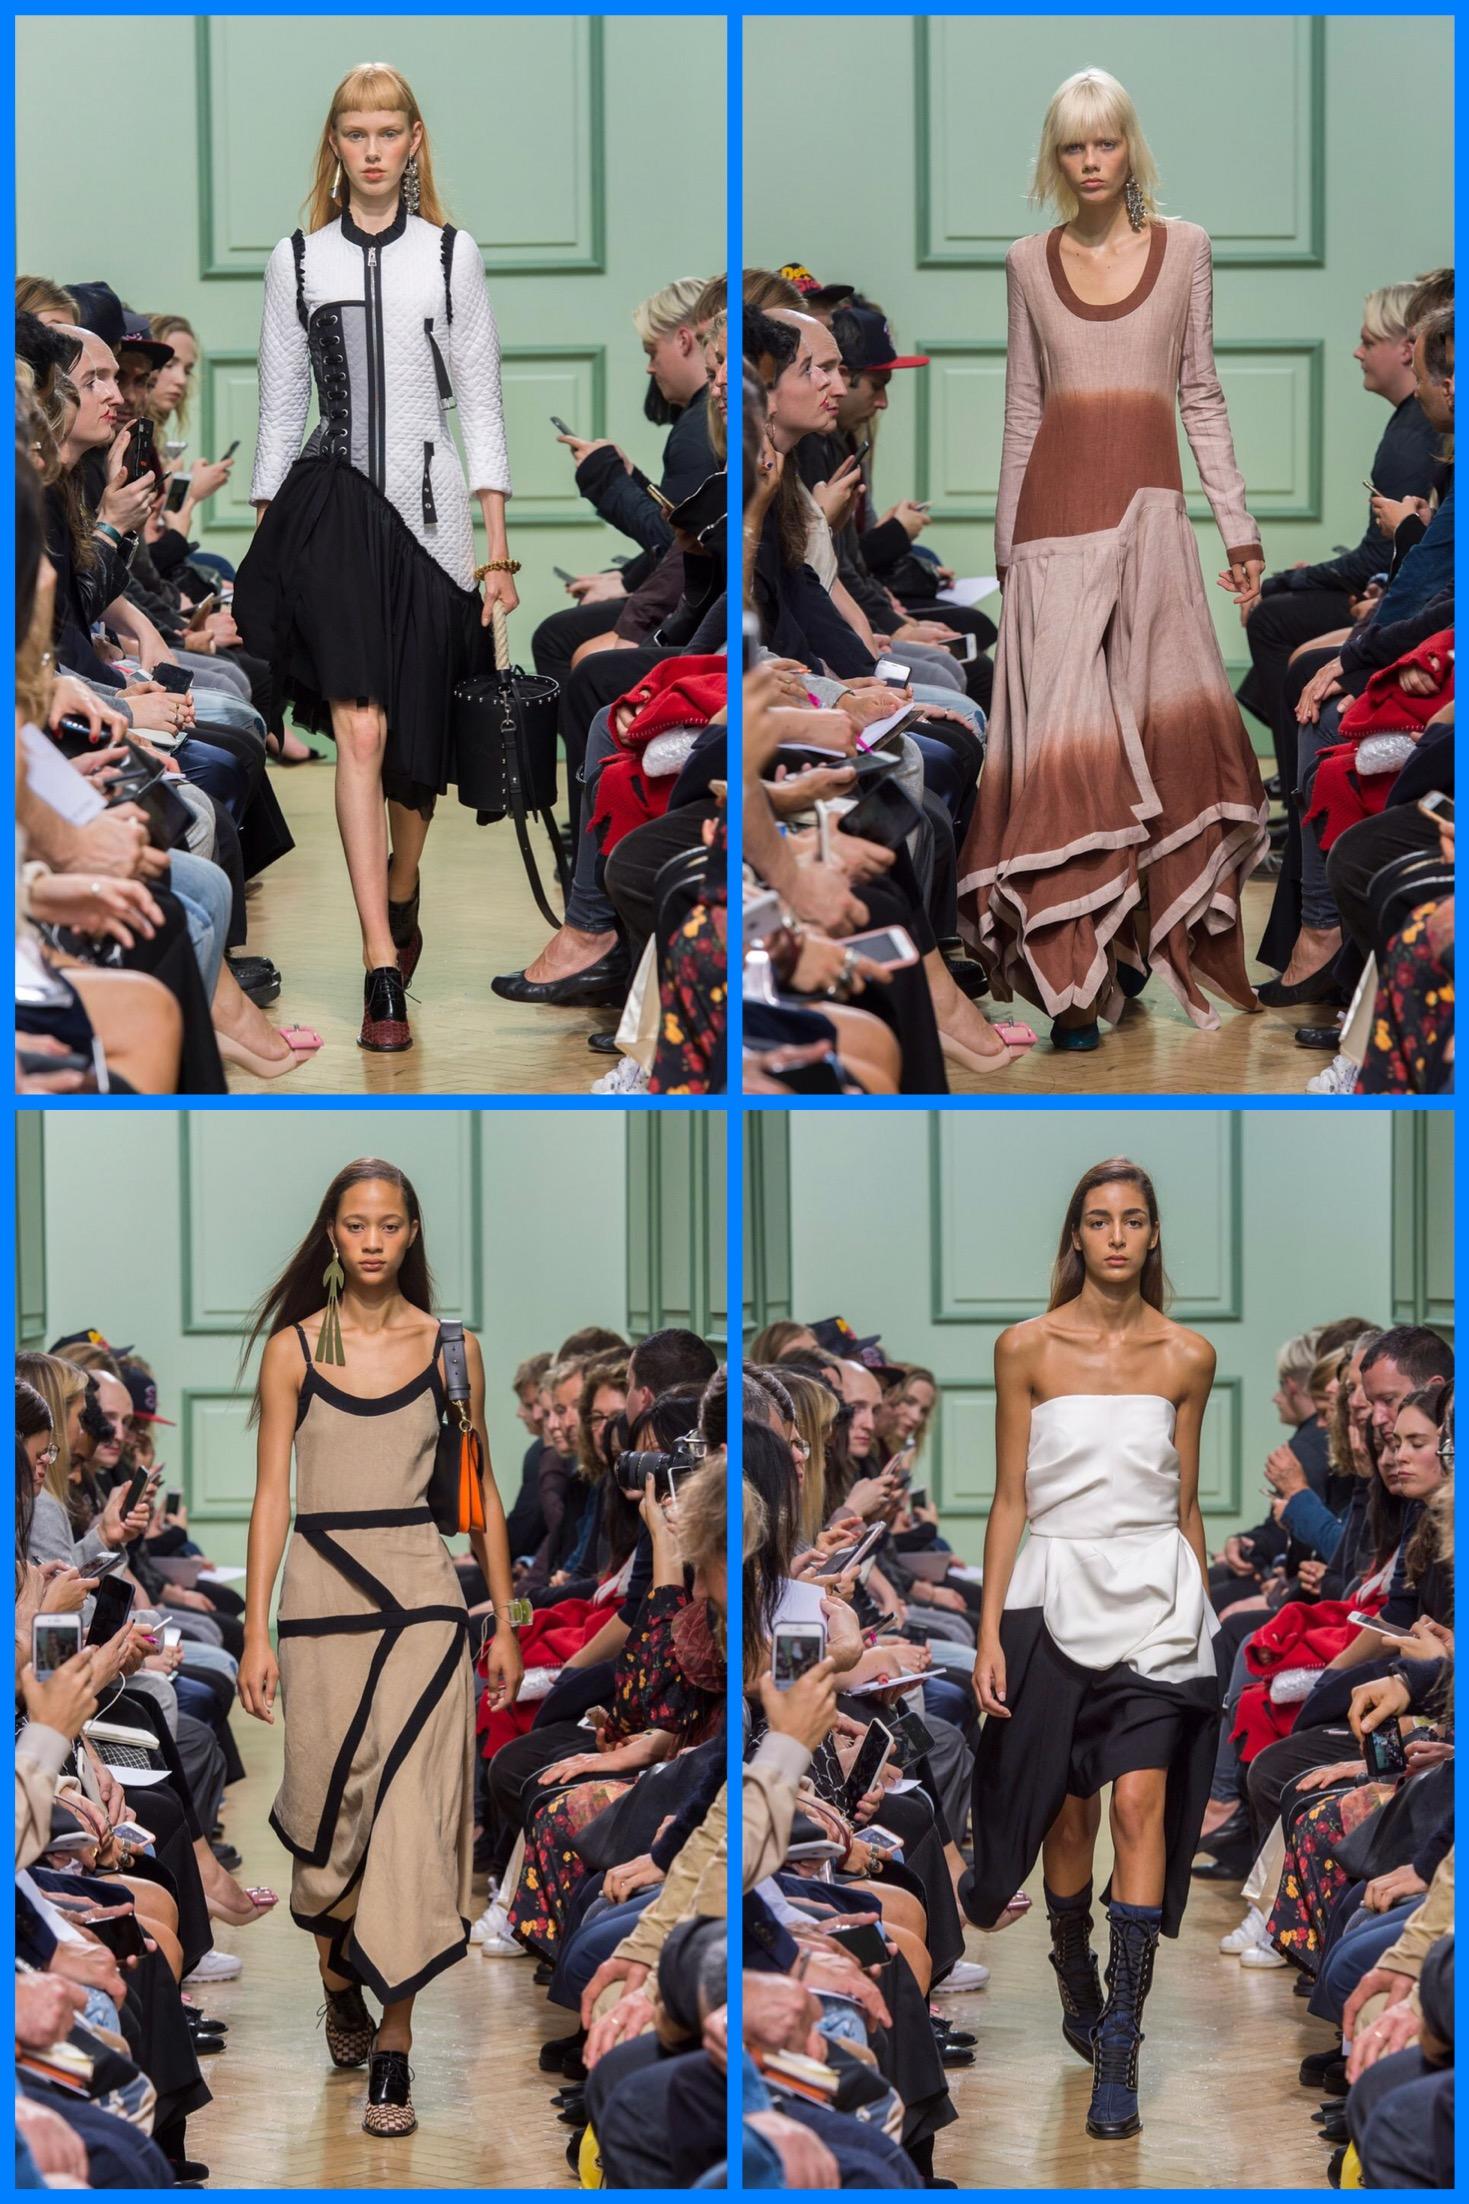 london-fashion-week-pret-a-porter-spring-summer-2017-style-j-w-anderson